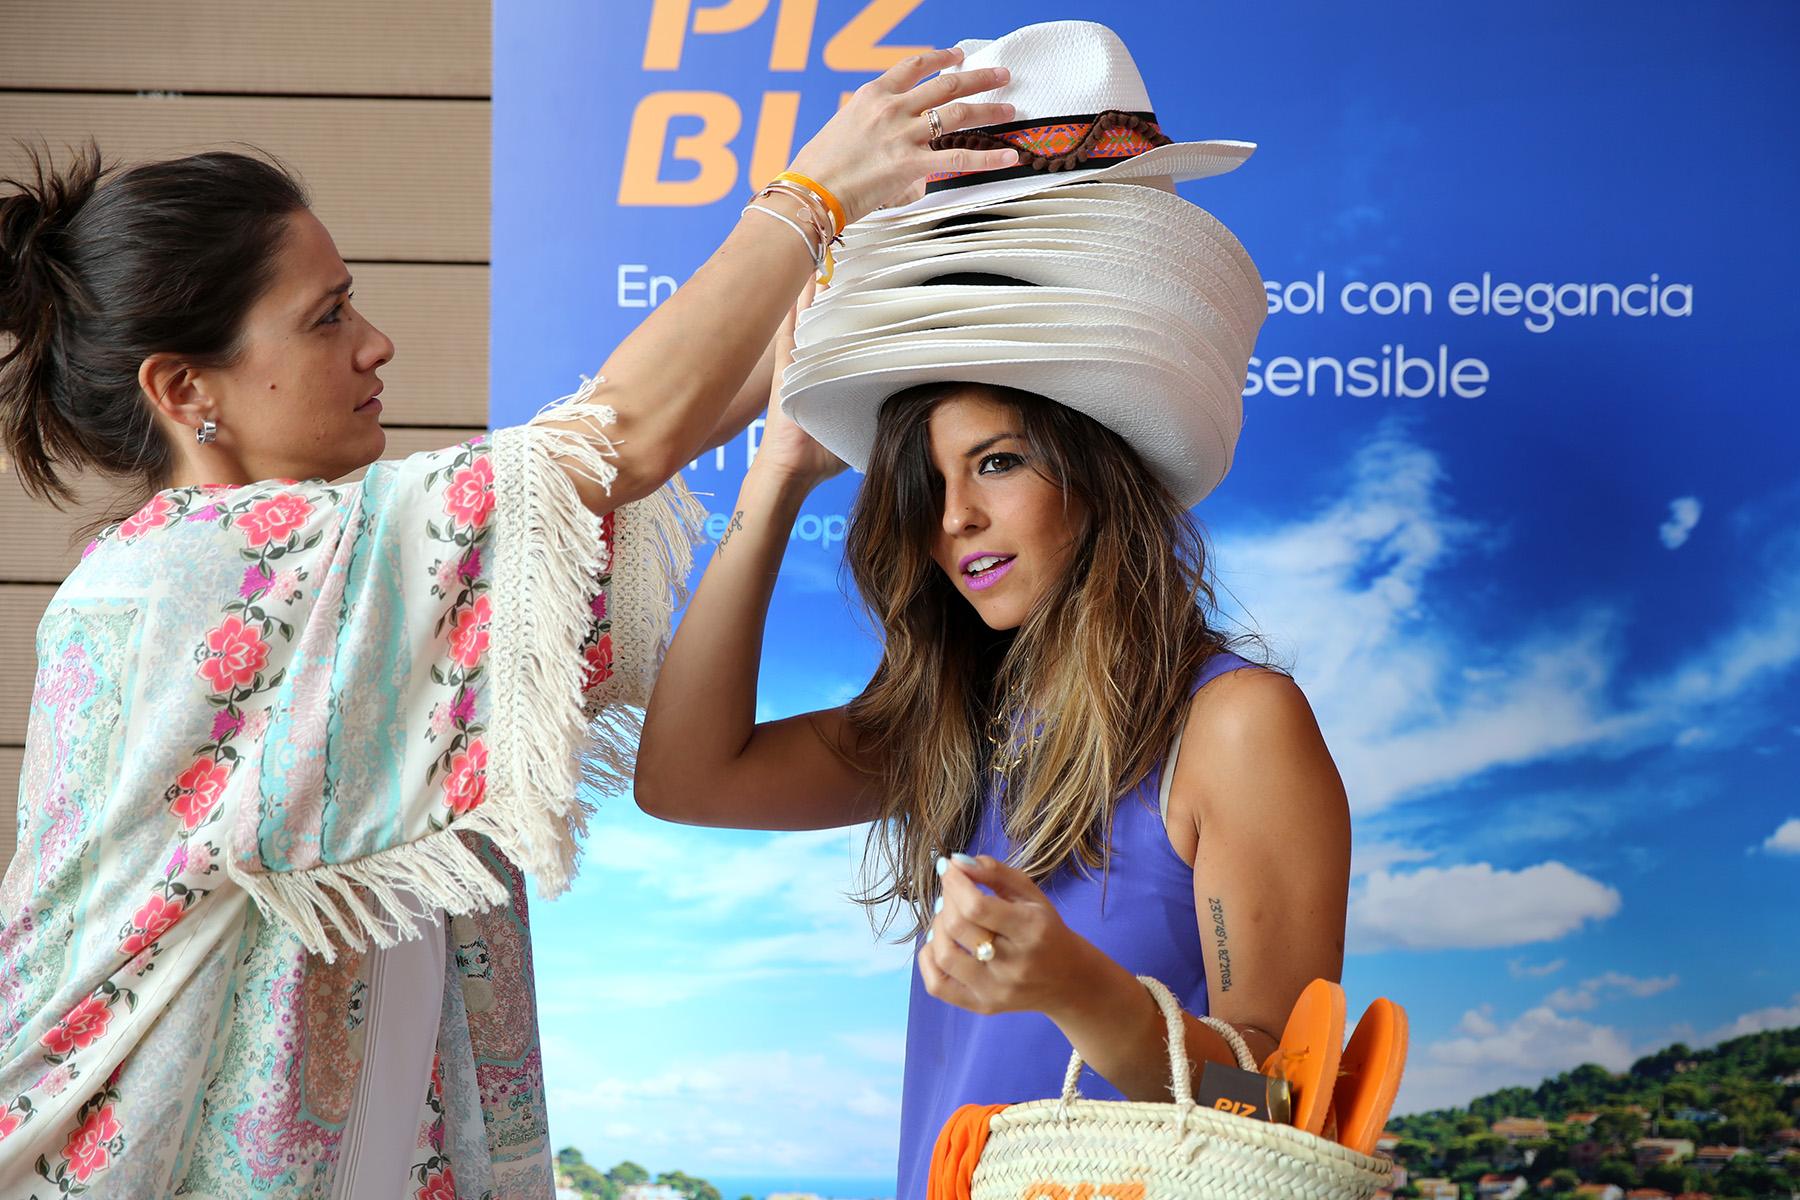 trendy_taste-look-outfit-street_style-ootd-blog-blogger-fashion_spain-moda_españa-piz_buin-purple_top-falda_blanca-top_lila-sandalias_doradas-golden_sandals-sorteo-evento-29